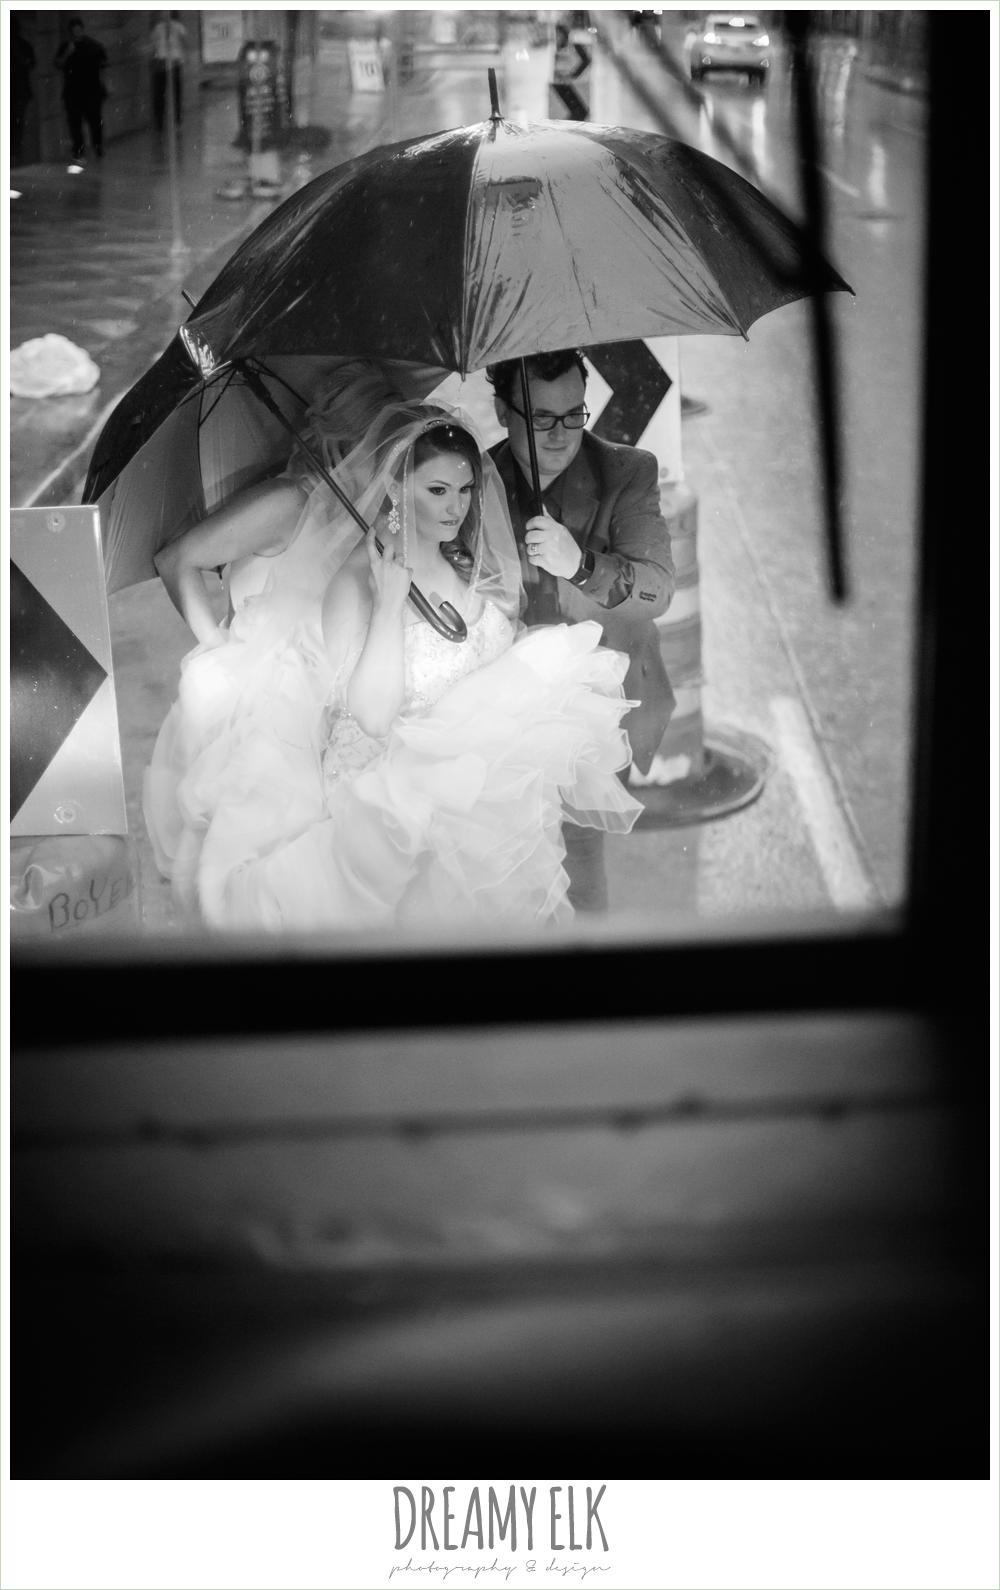 rainy wedding day, bride under an umbrella, spring wedding, magnolia hotel, houston, texas {dreamy elk photography and design}